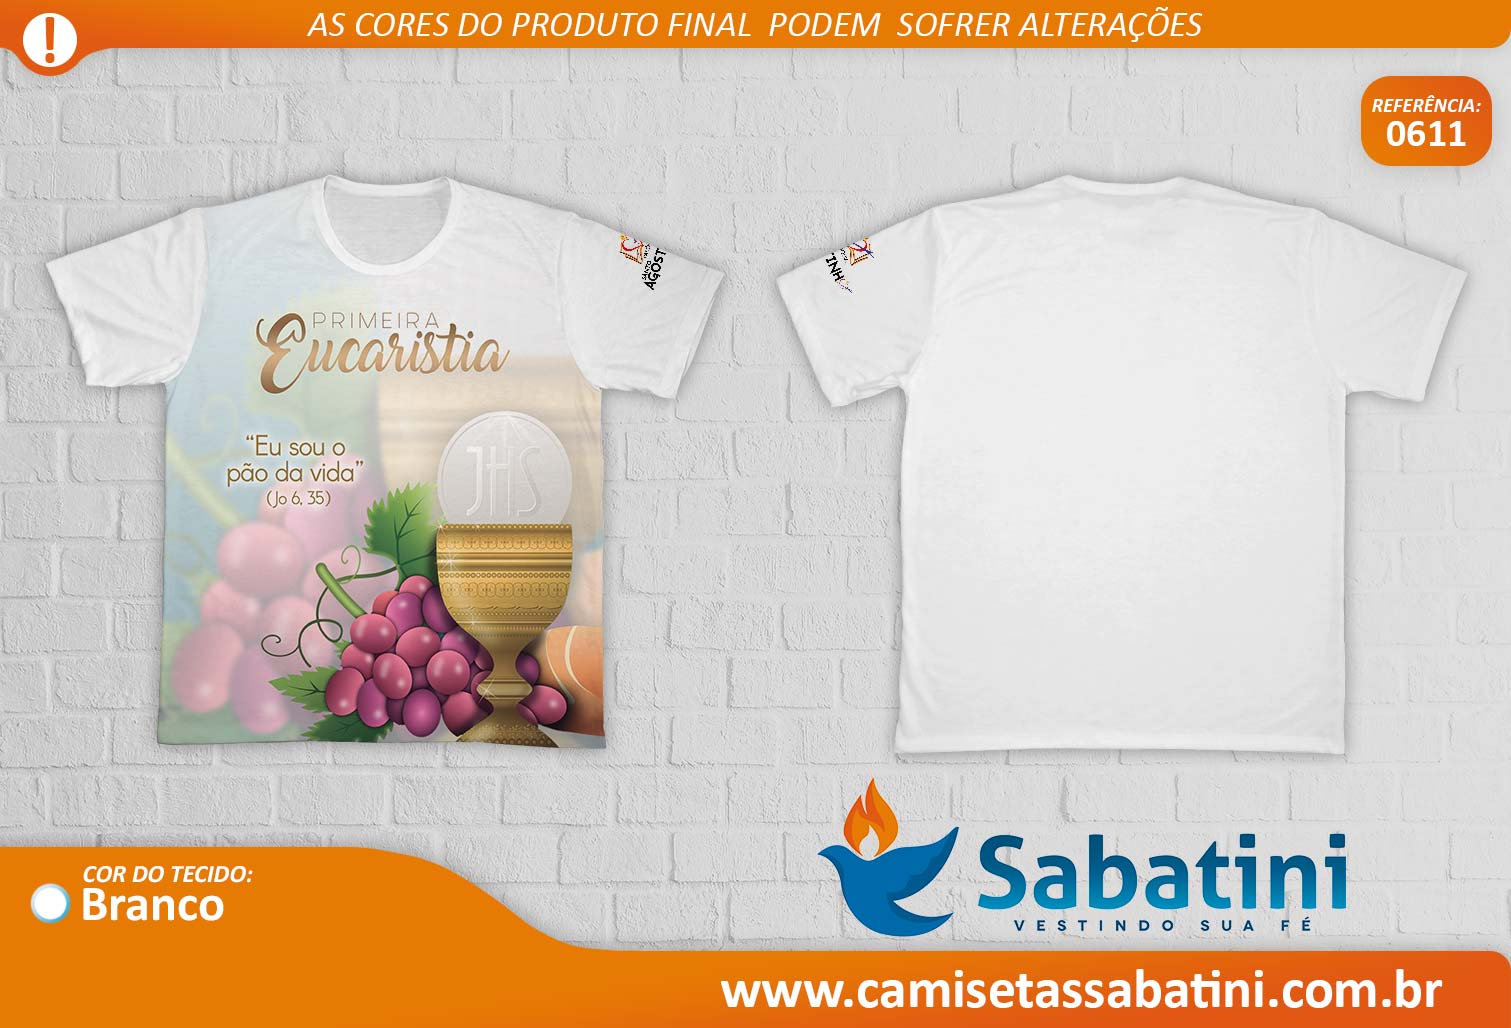 Camiseta Personalizada - REF.0611 - Primeira Eucaristia - Paróquia Santo Agostinho - ID15138478  - Camisetas Sabatini